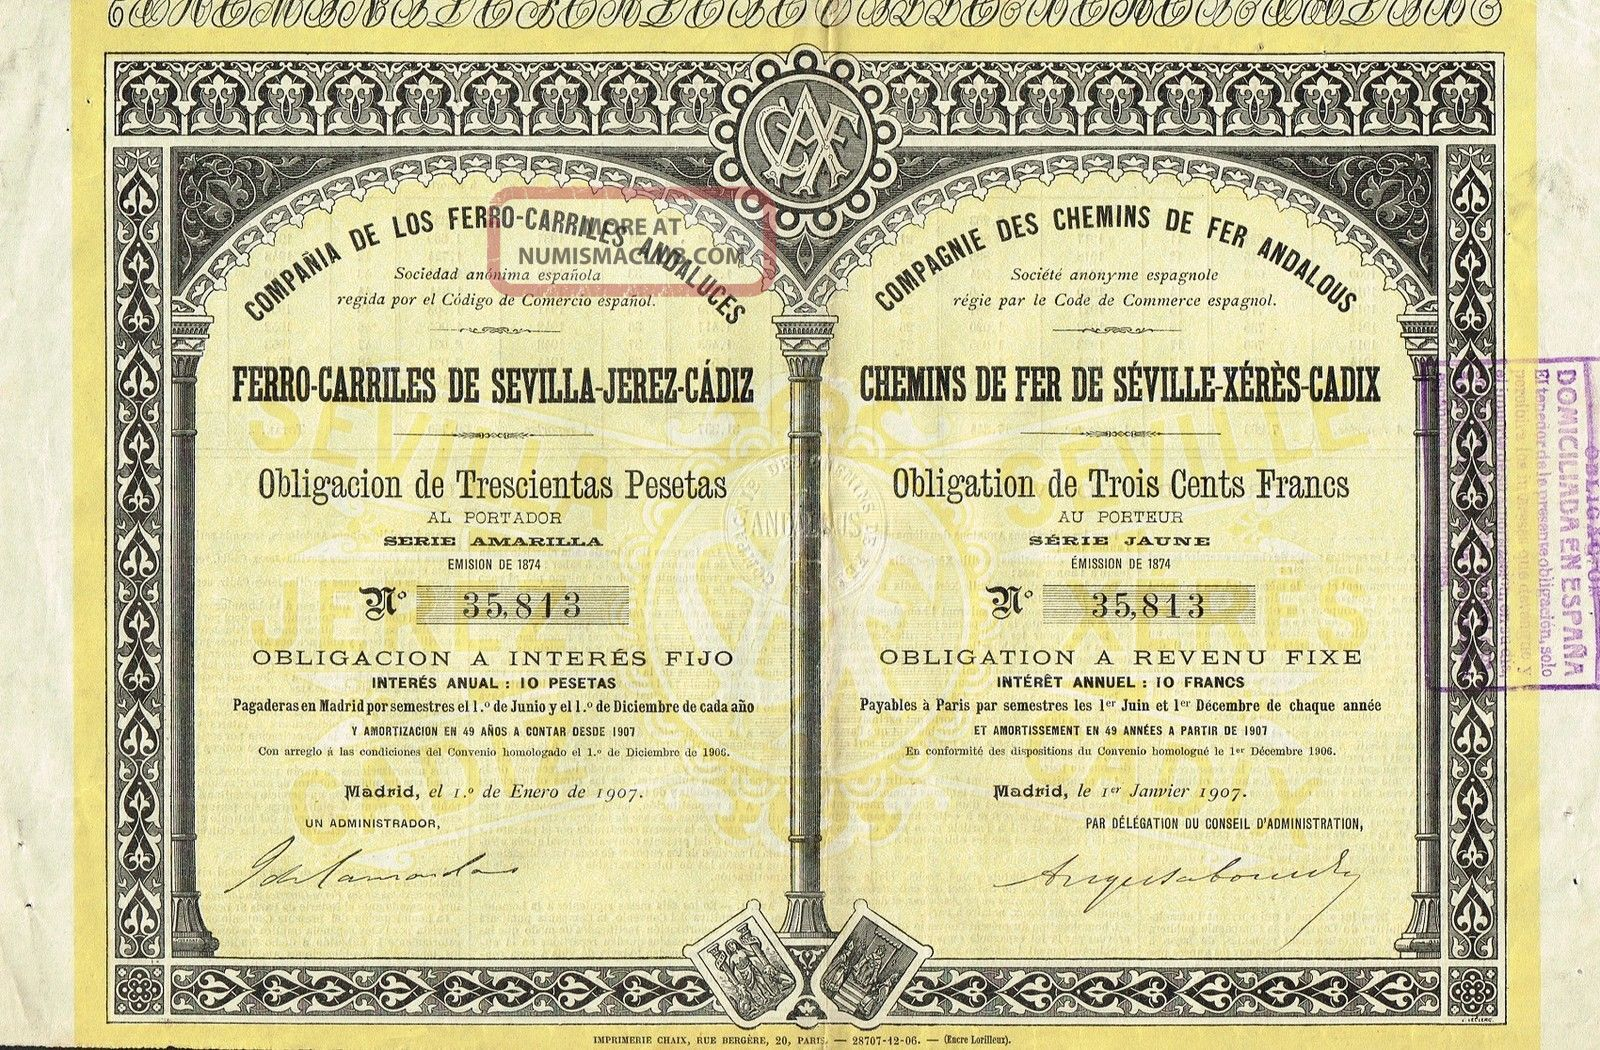 Spain Sevilla - Jerez - Cadiz Railway Company Stock Certificate 1907 W/coupons World photo